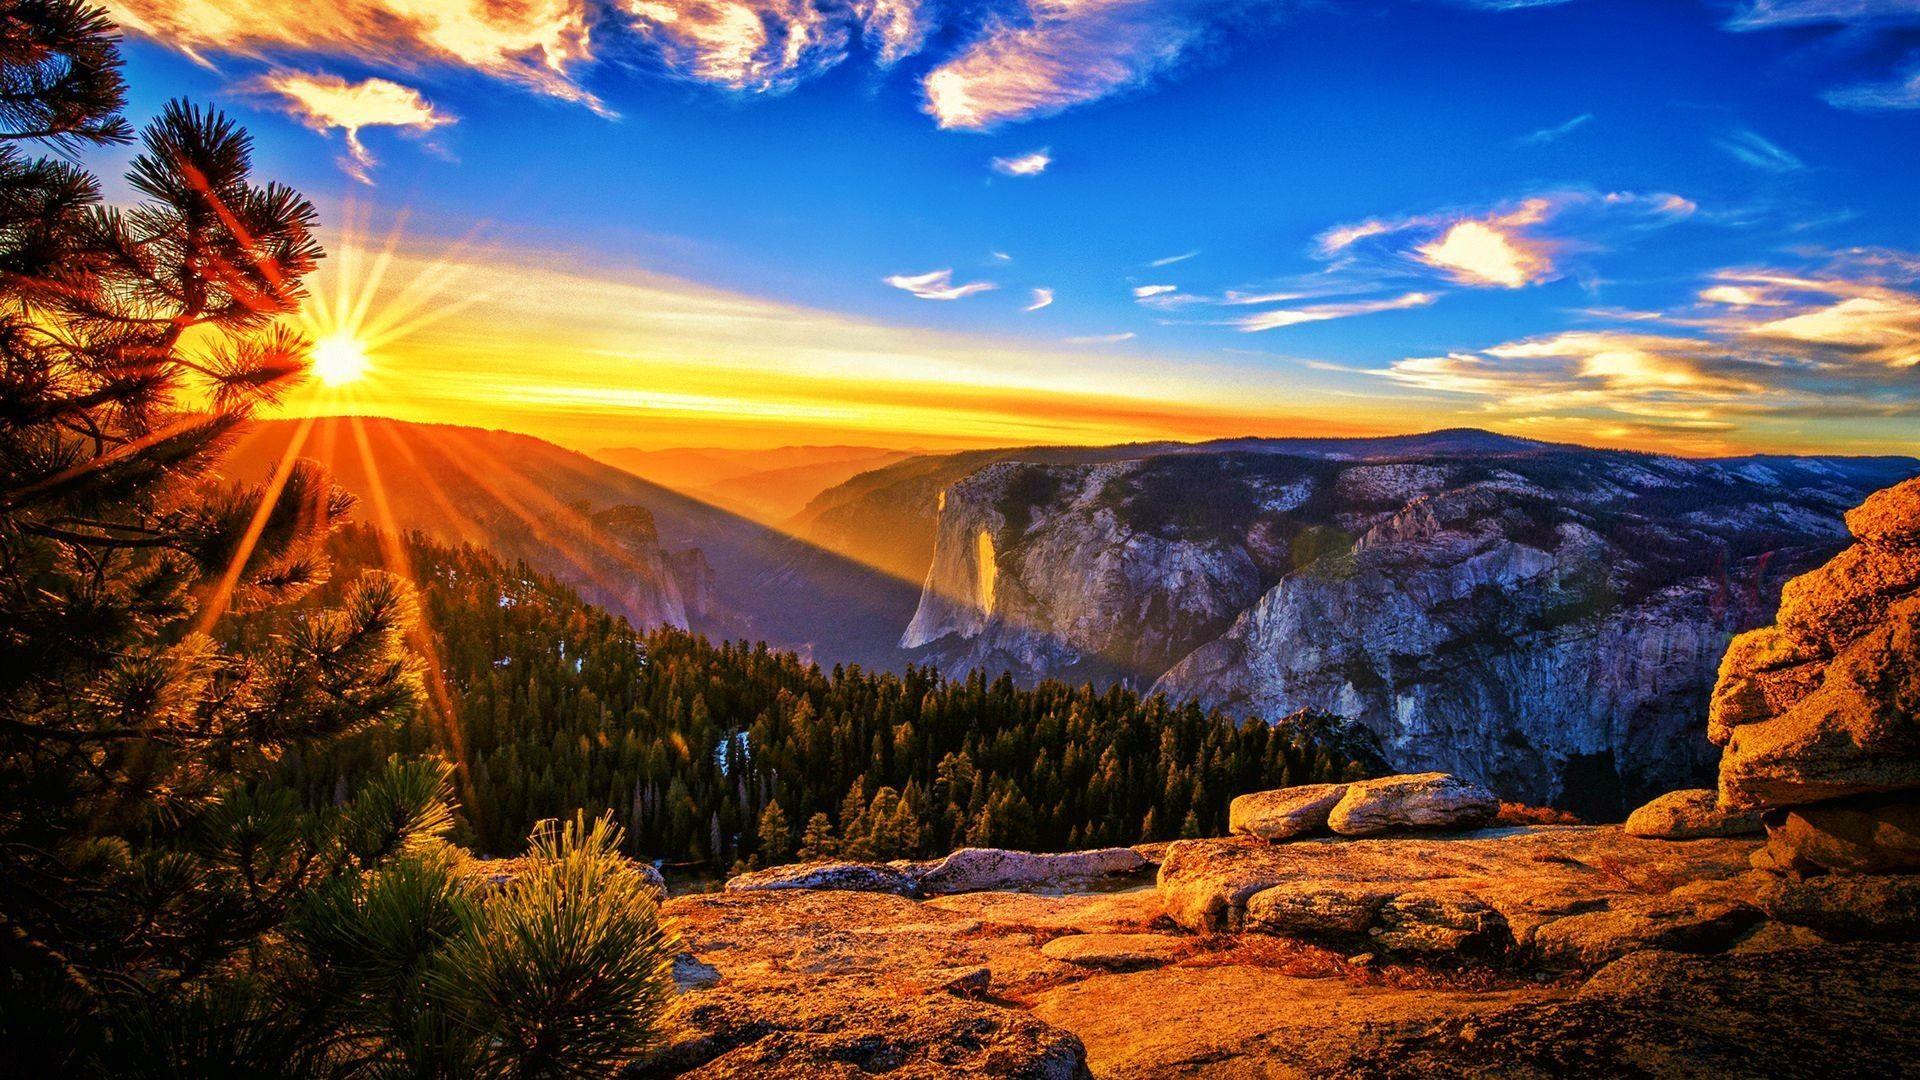 Beautiful Sunrise Wallpapers On Wallpaperdog In 2020 Sunset Landscape Sunrise Wallpaper Landscape Wallpaper